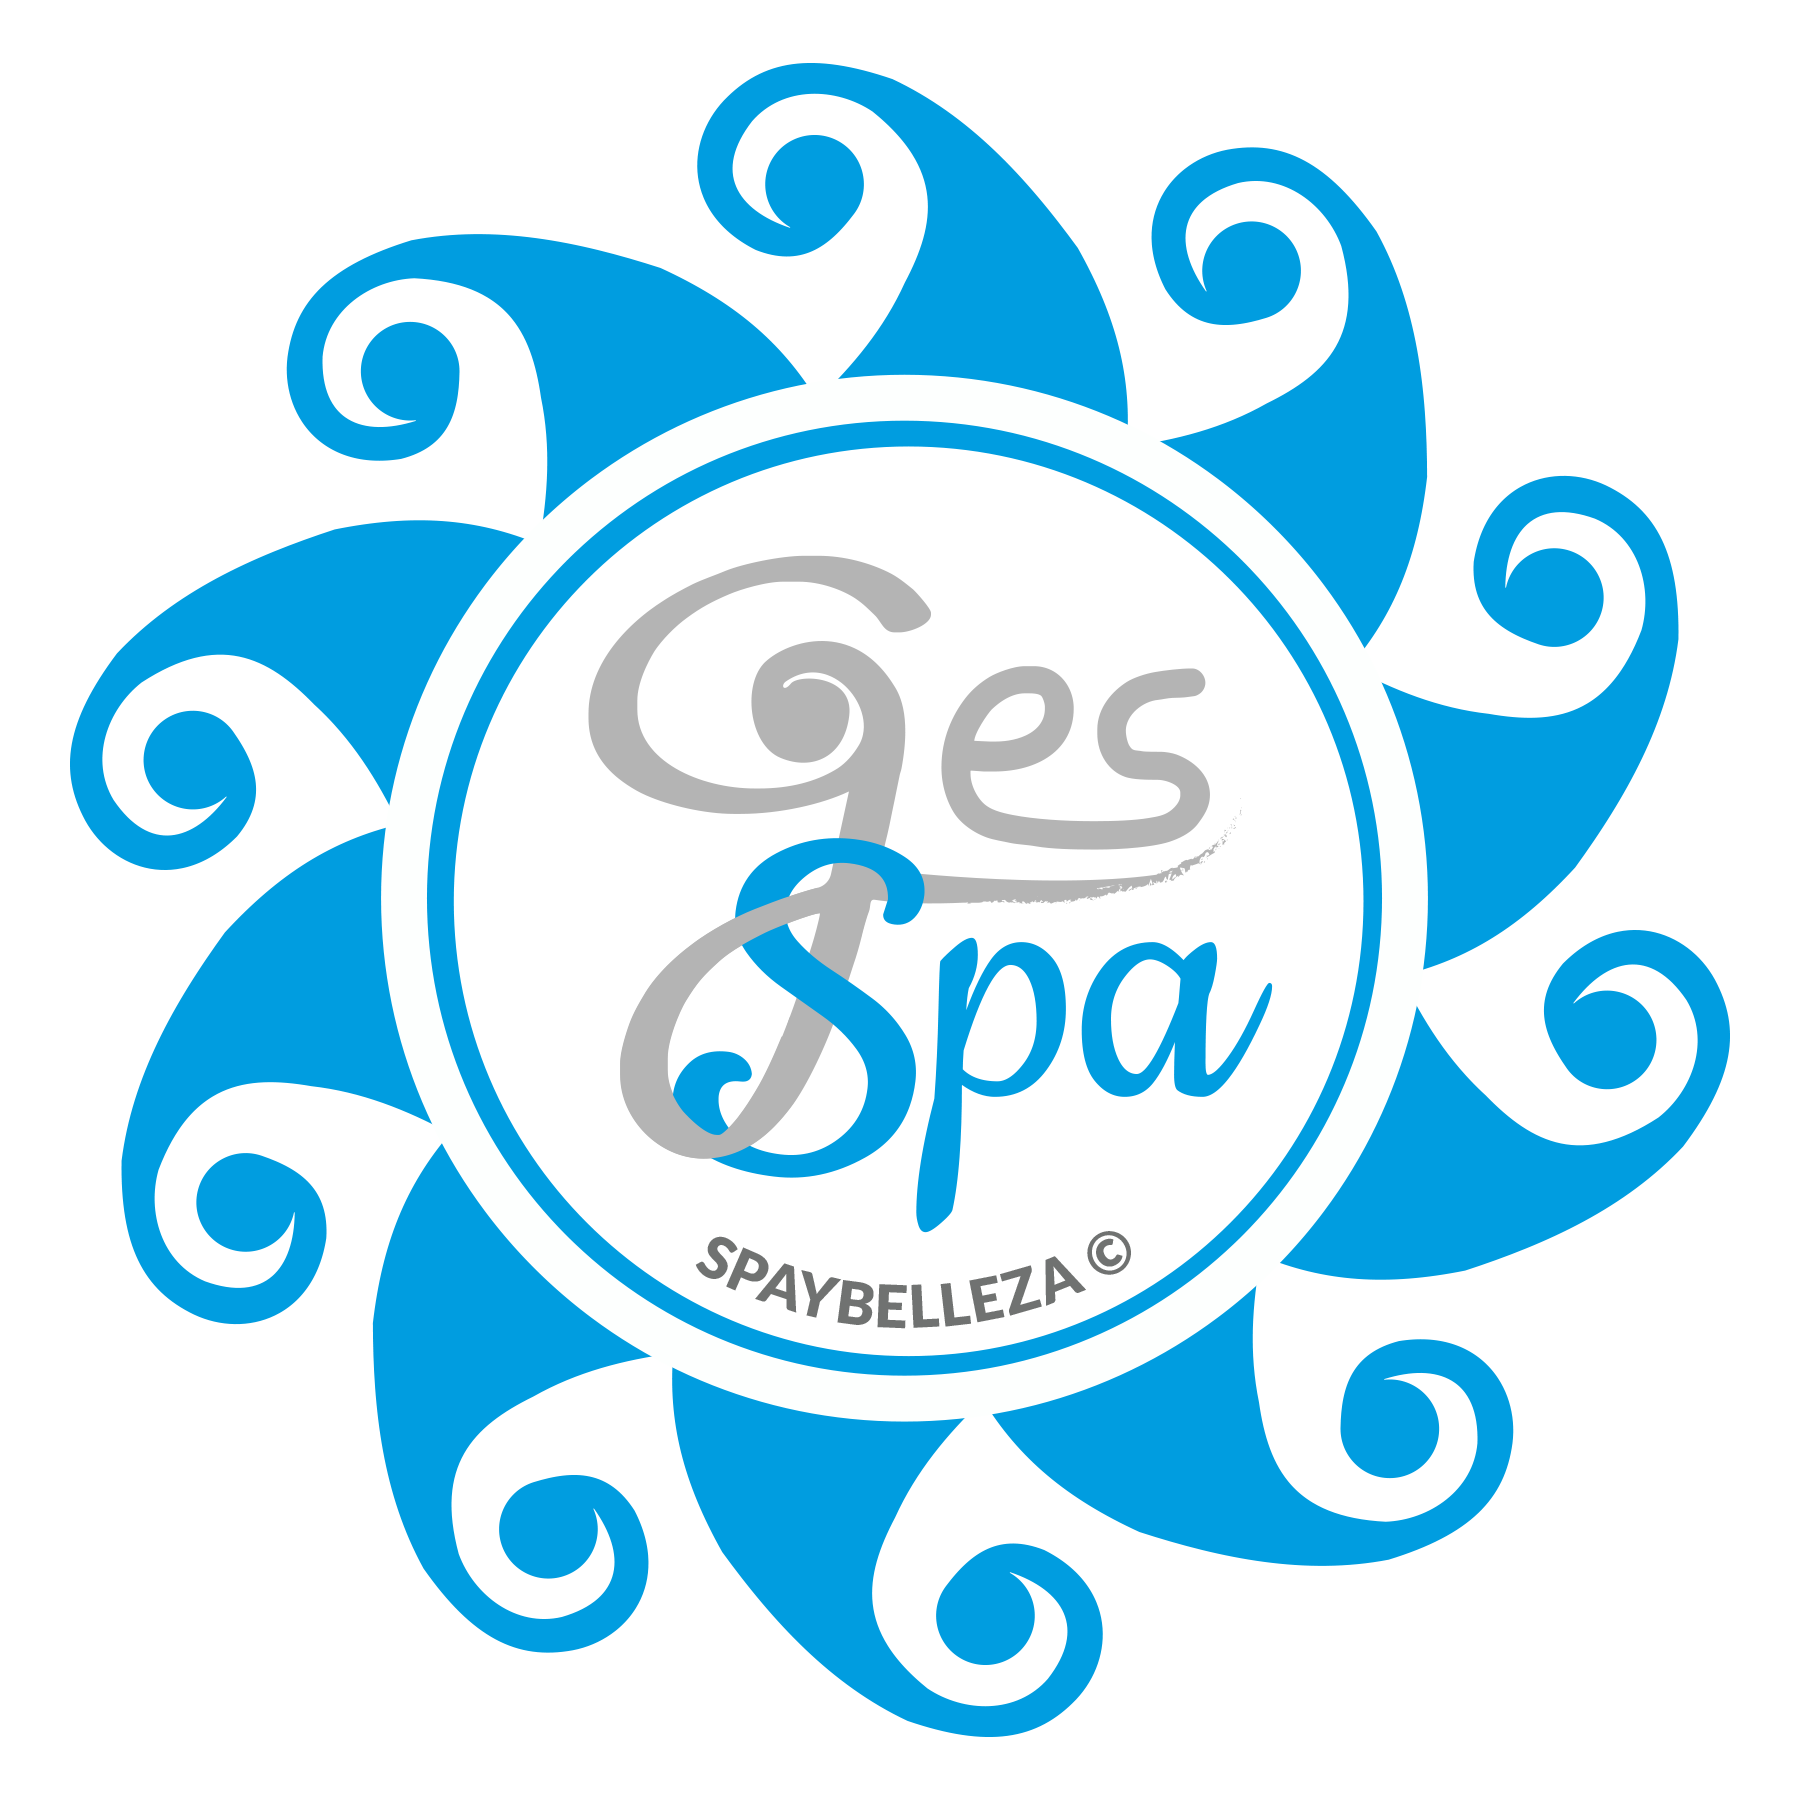 Grupo Ges Spa